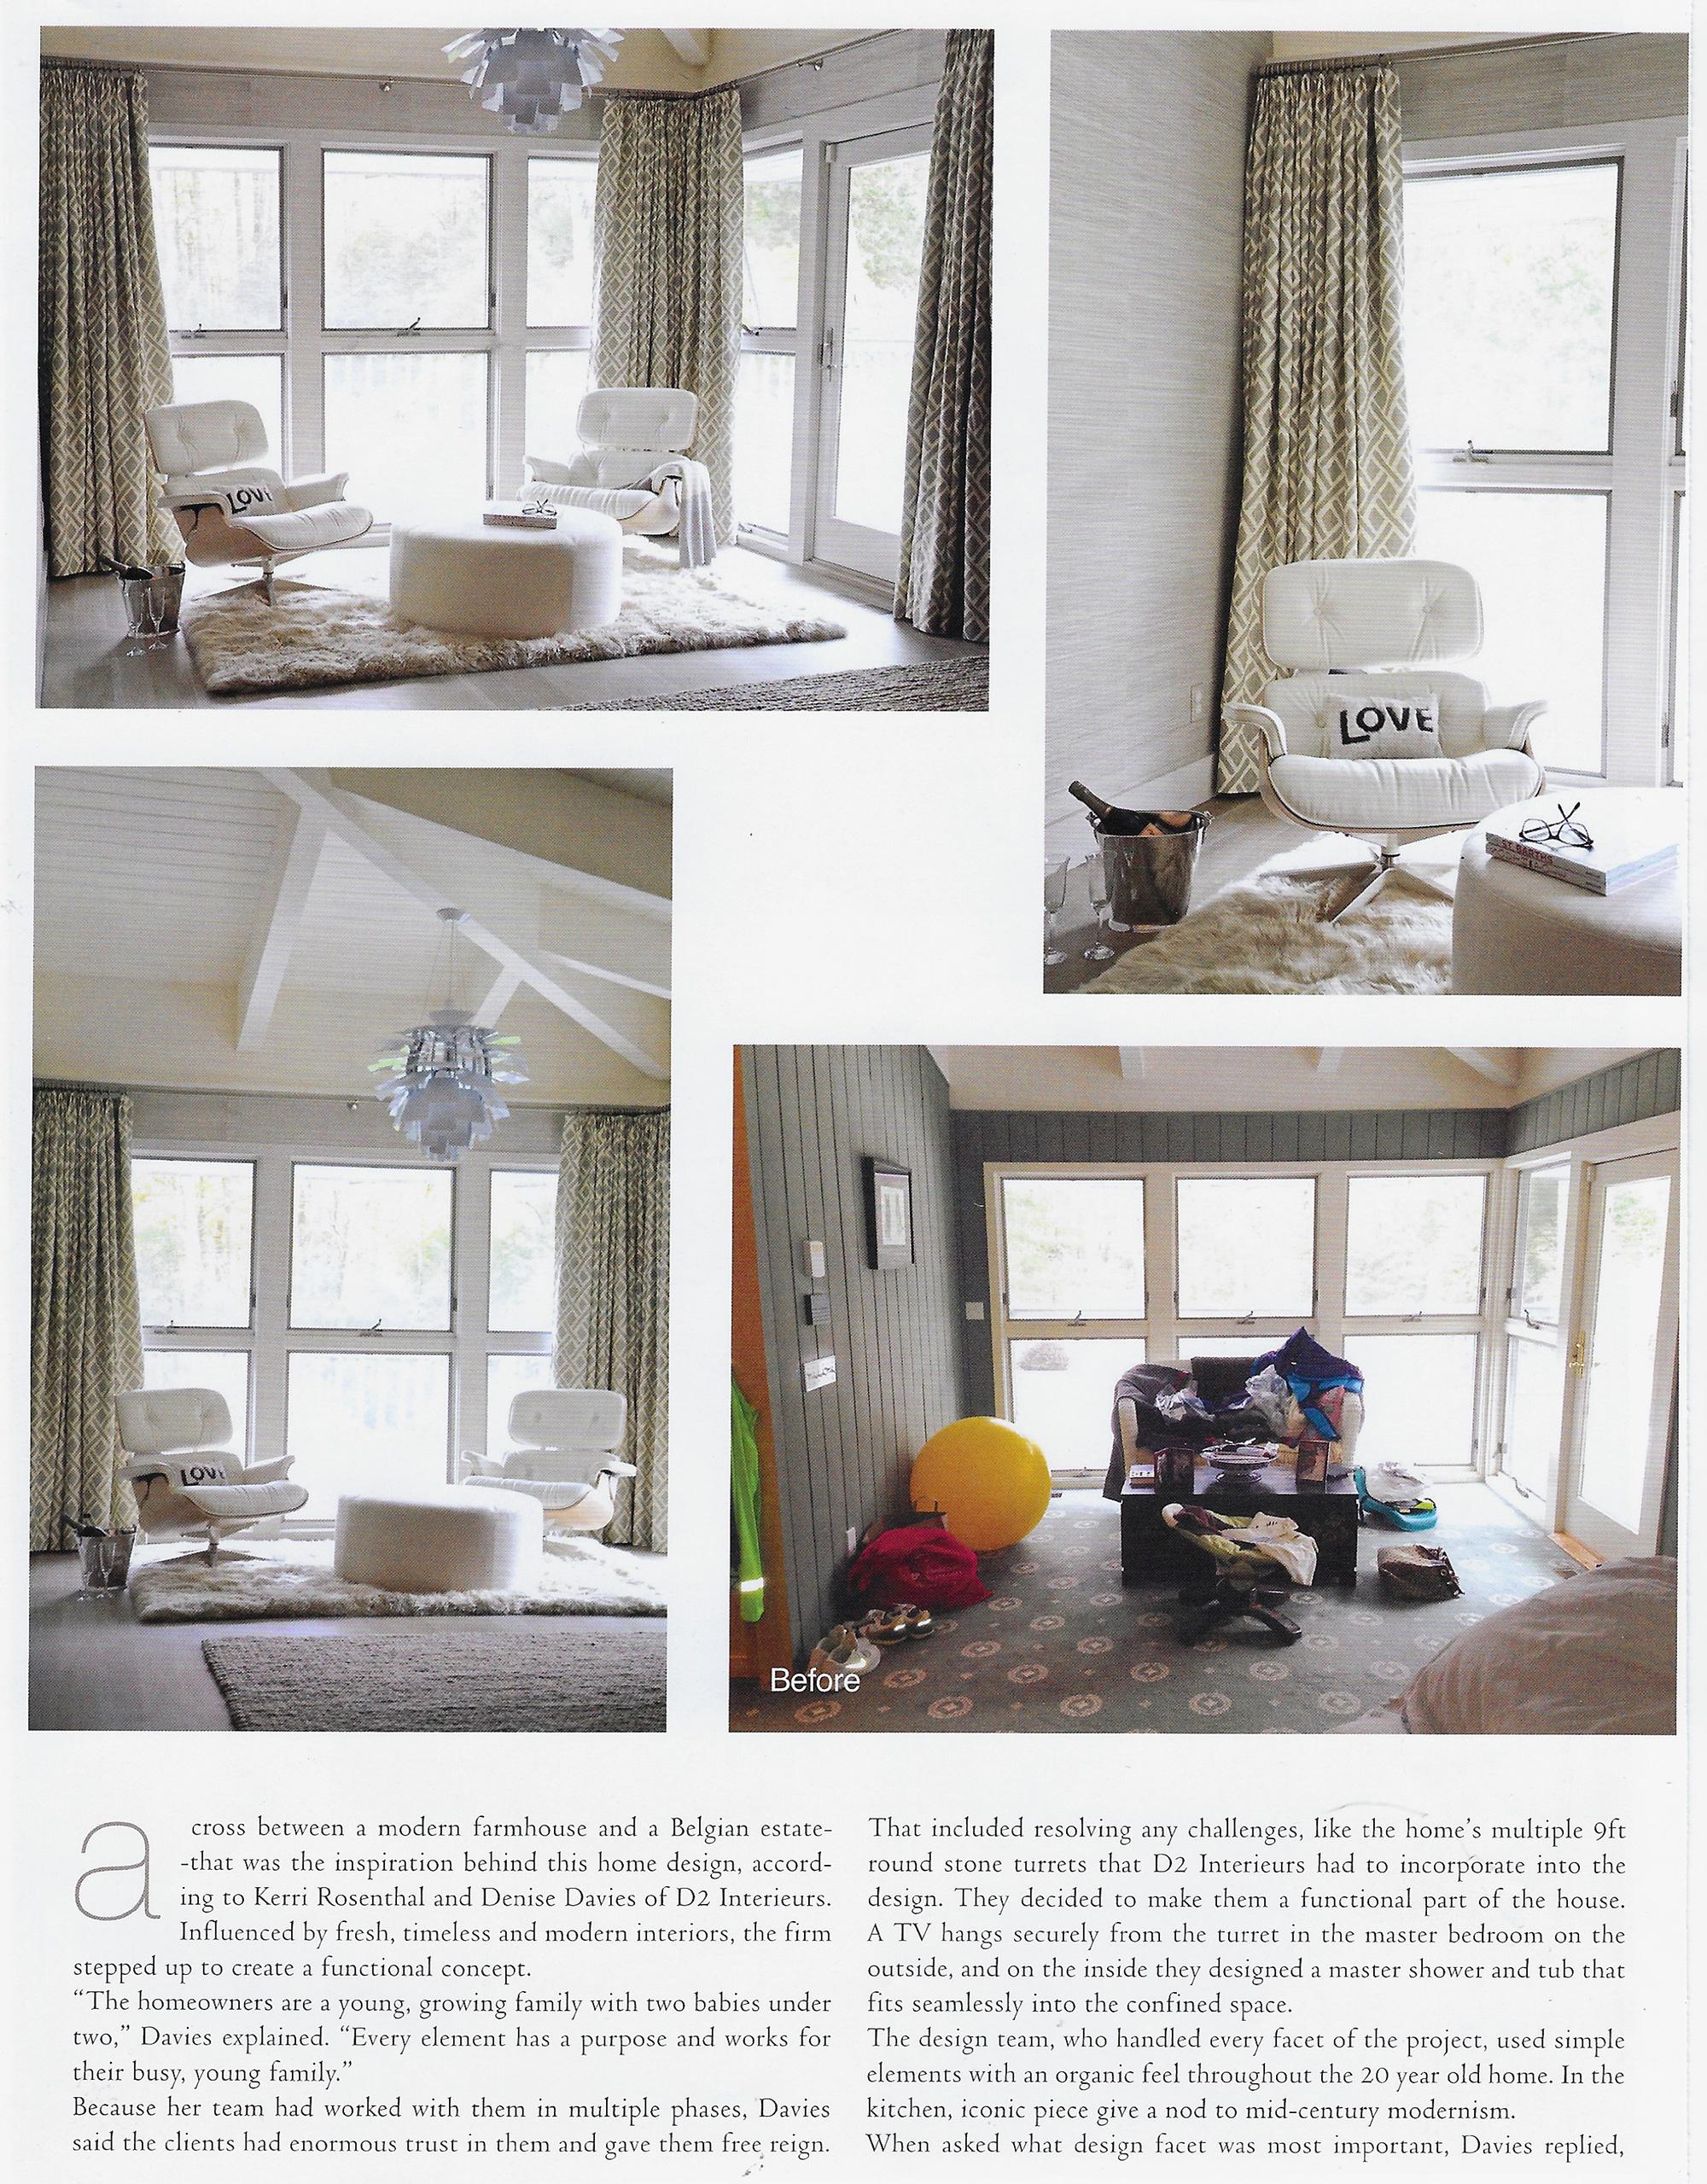 east-coast-home-design-idyllic-design-transformation-2